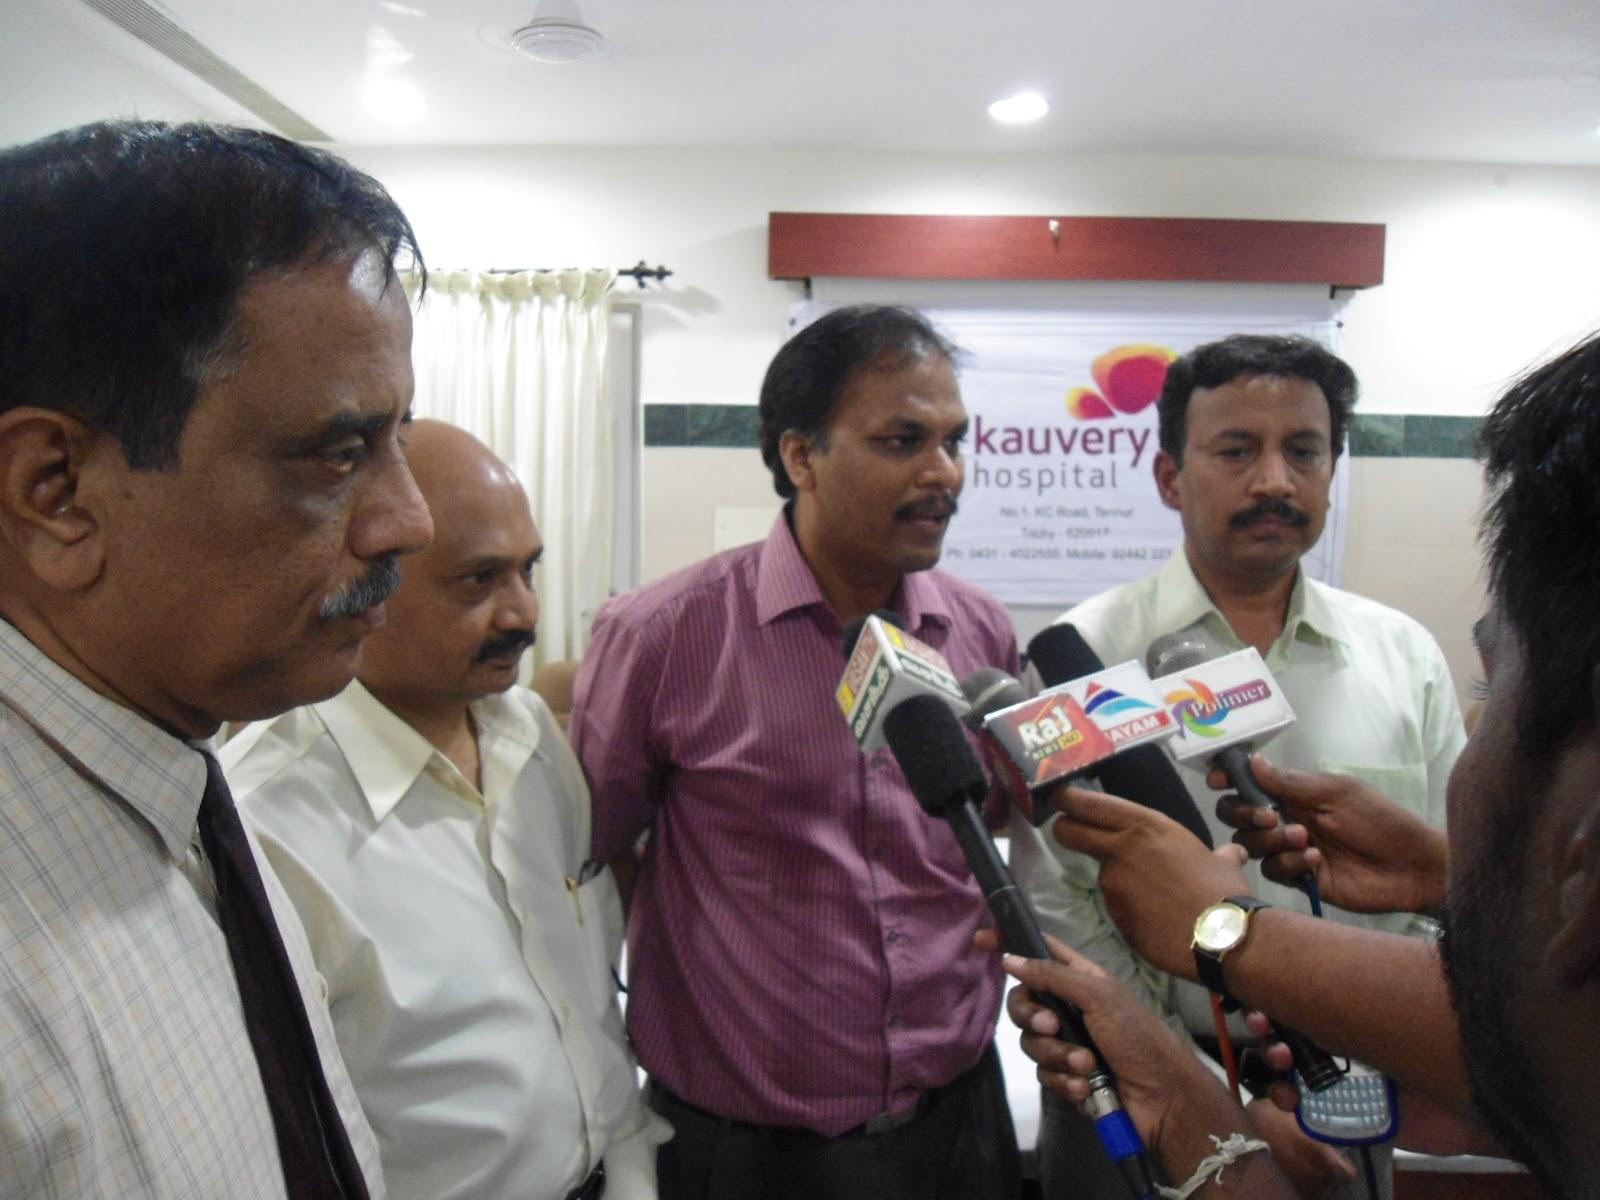 Interventional Cardiology at Kauvery Hospital - ASD and PDA